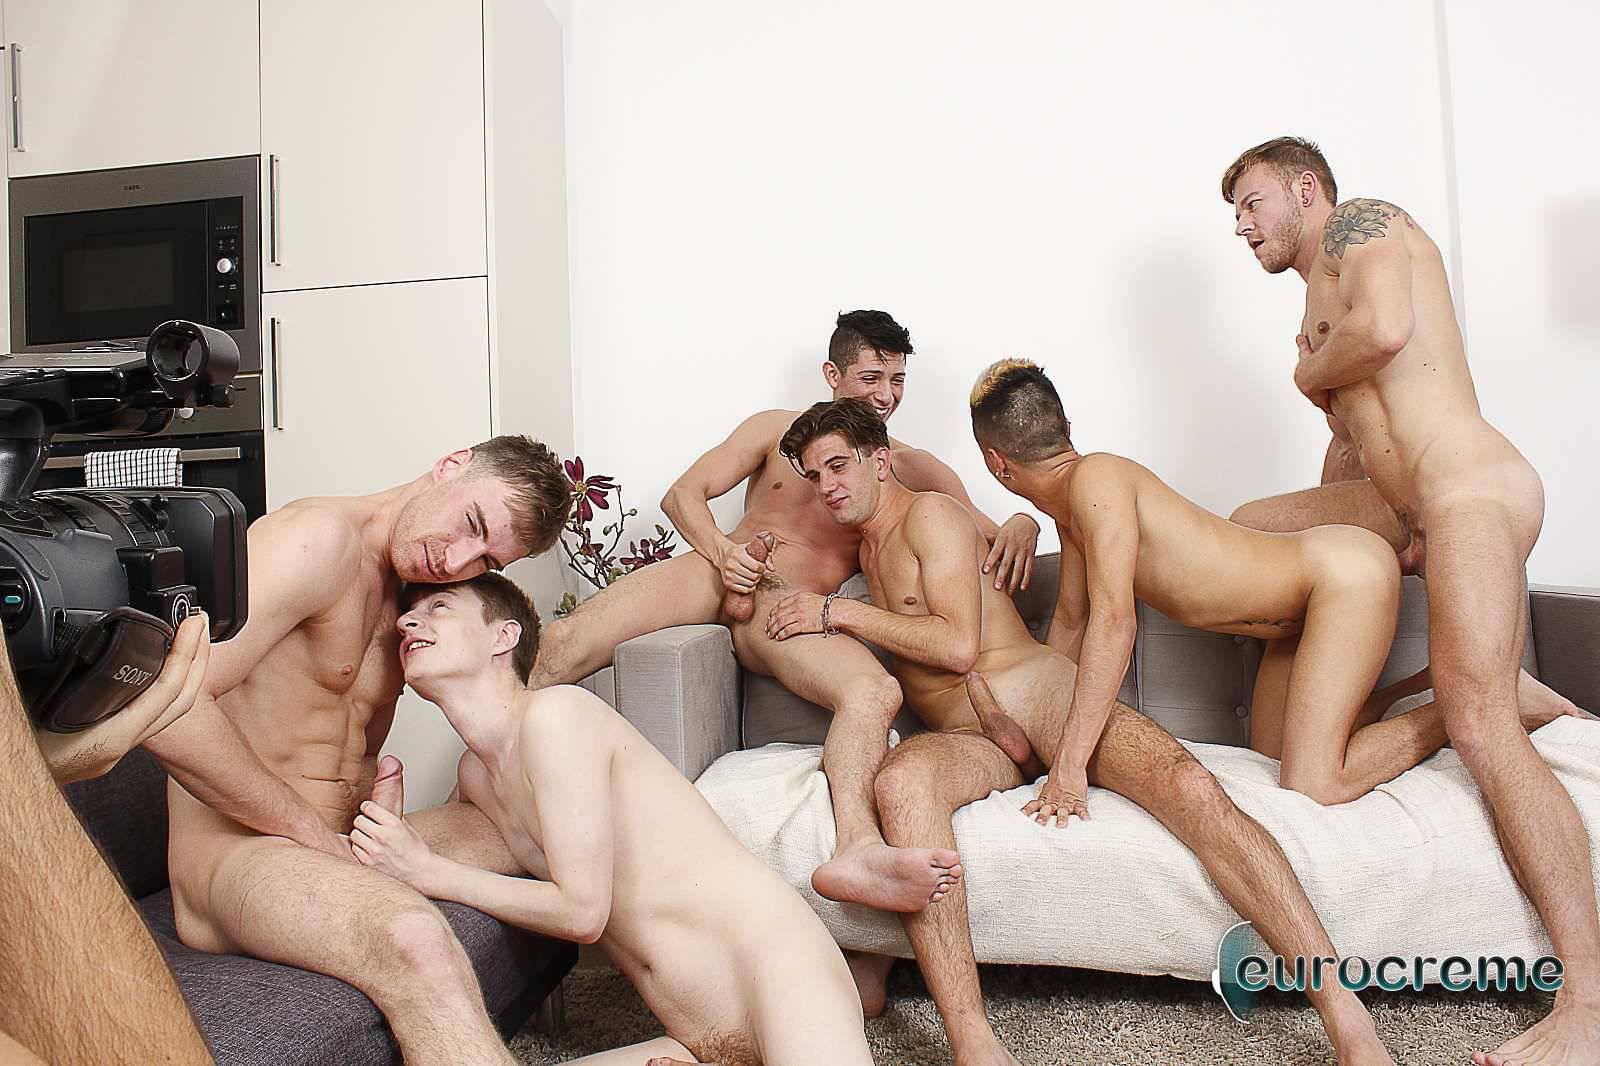 gayorgy scenes